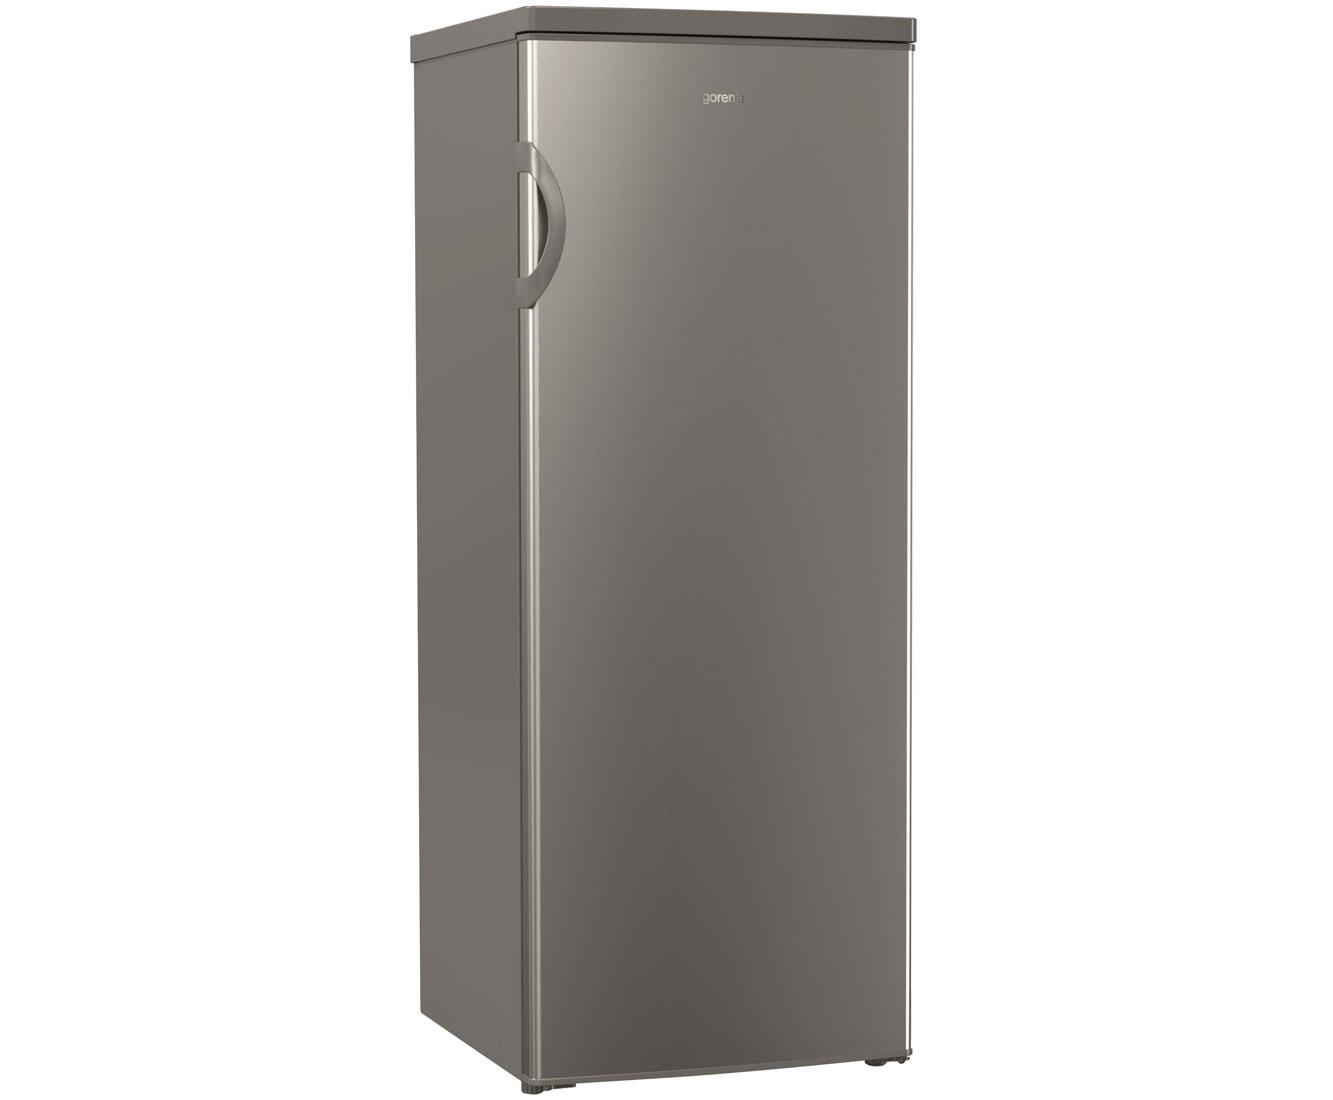 Gorenje Kühlschrank R6193lx : Maße kühlschrank freistehend exquisit ks rva